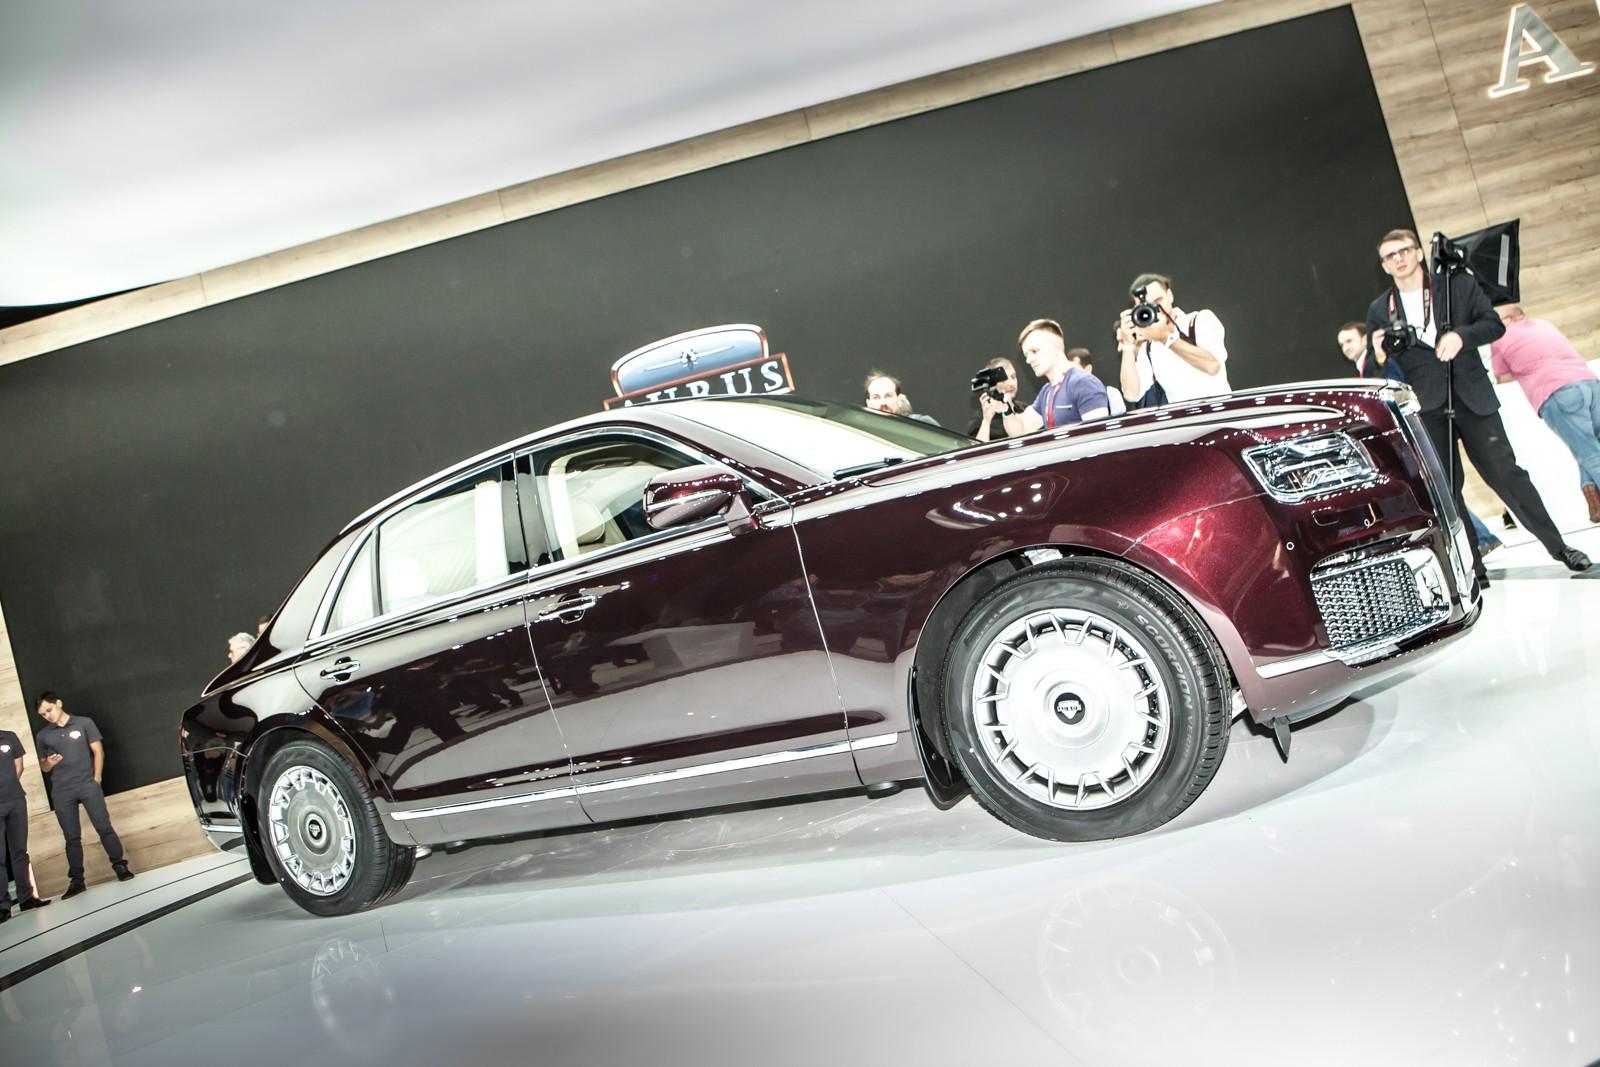 Шины от большой машины: «Кама» и Pirelli обувают Aurus-4123 вместо Michelin